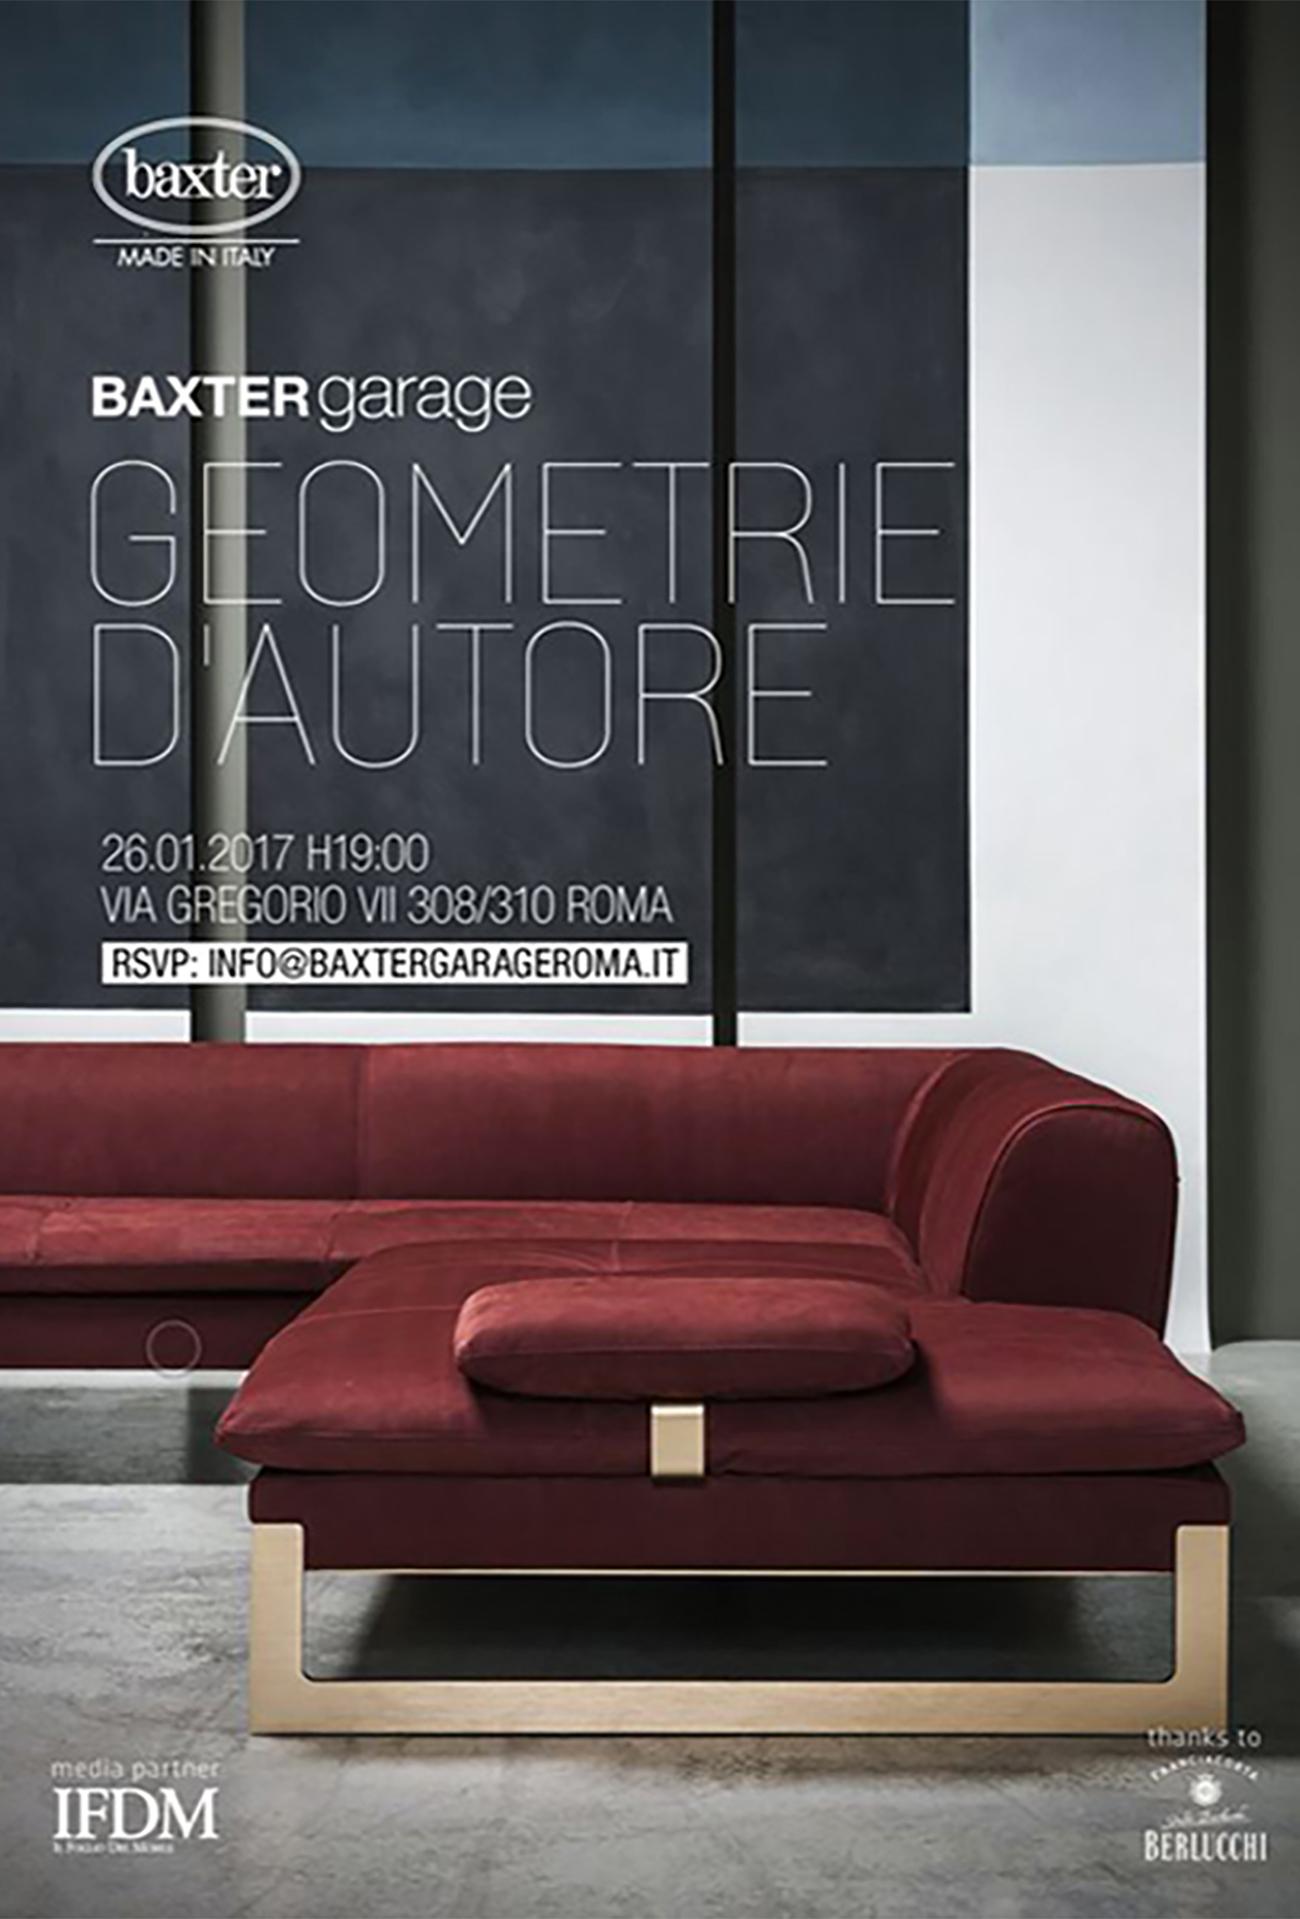 SERATA D'AUTORE AL BAXTER GARAGE CON IFDM